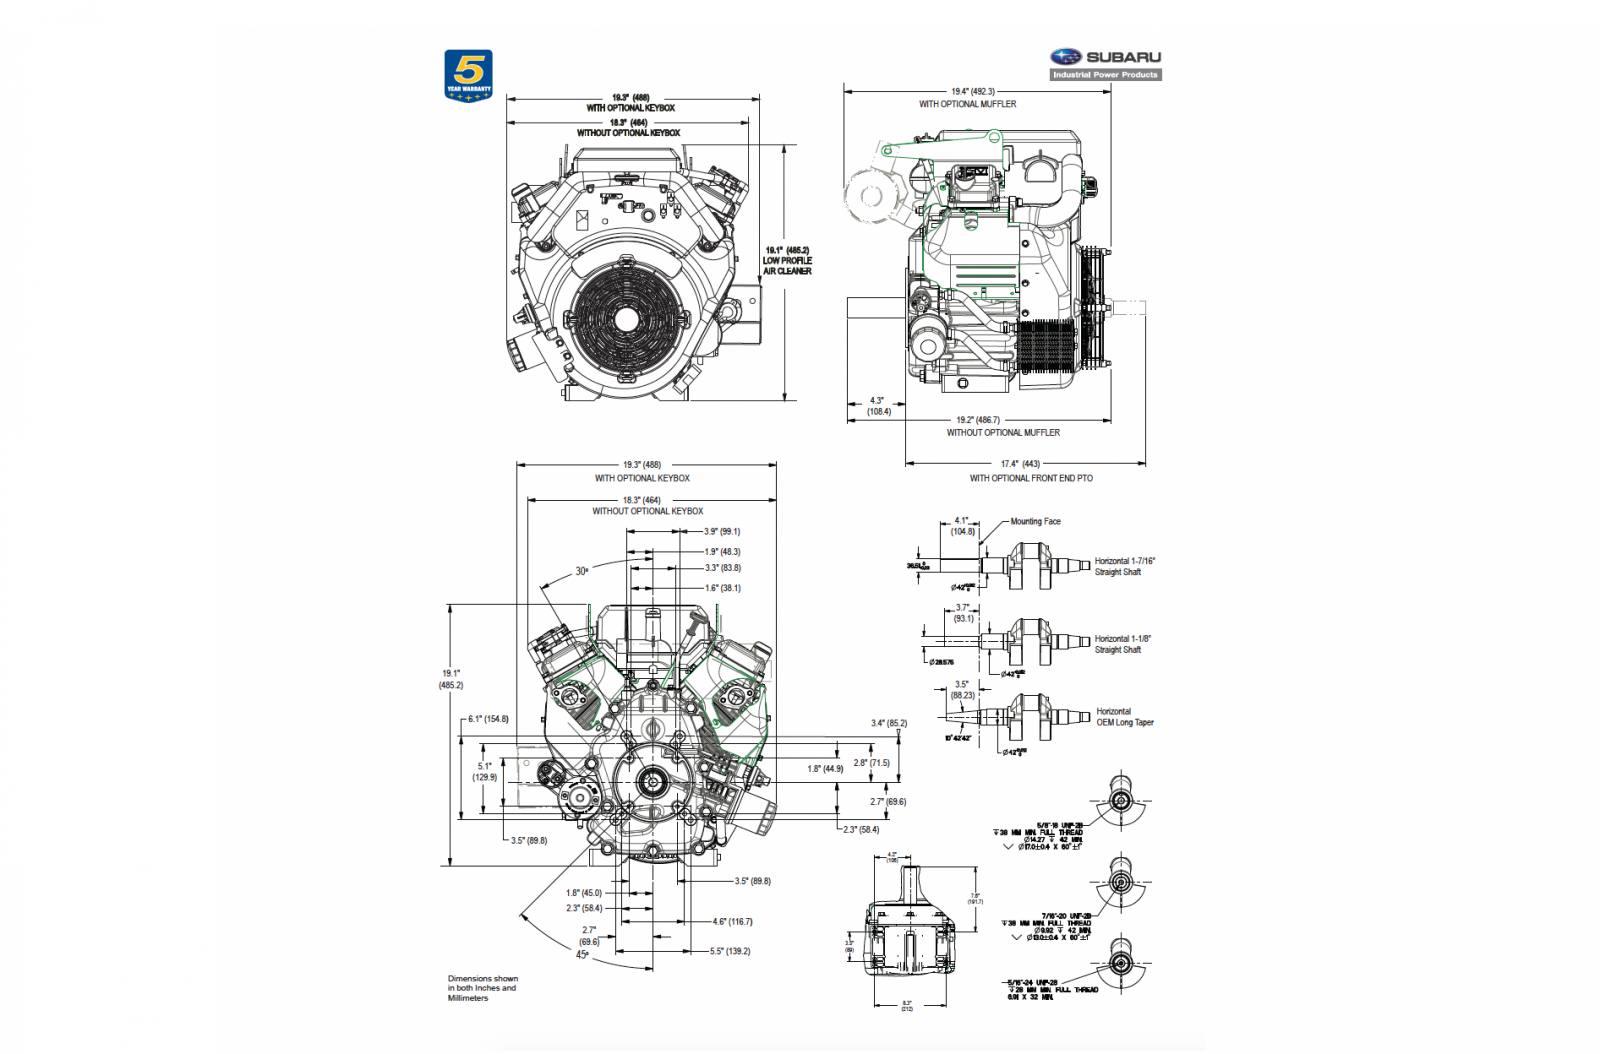 2017 Robin Subaru Eh99 For Sale Irrigators Supply Mckinney 972 Hp Tecumseh Engine Diagrams Car Tuning 562 5390